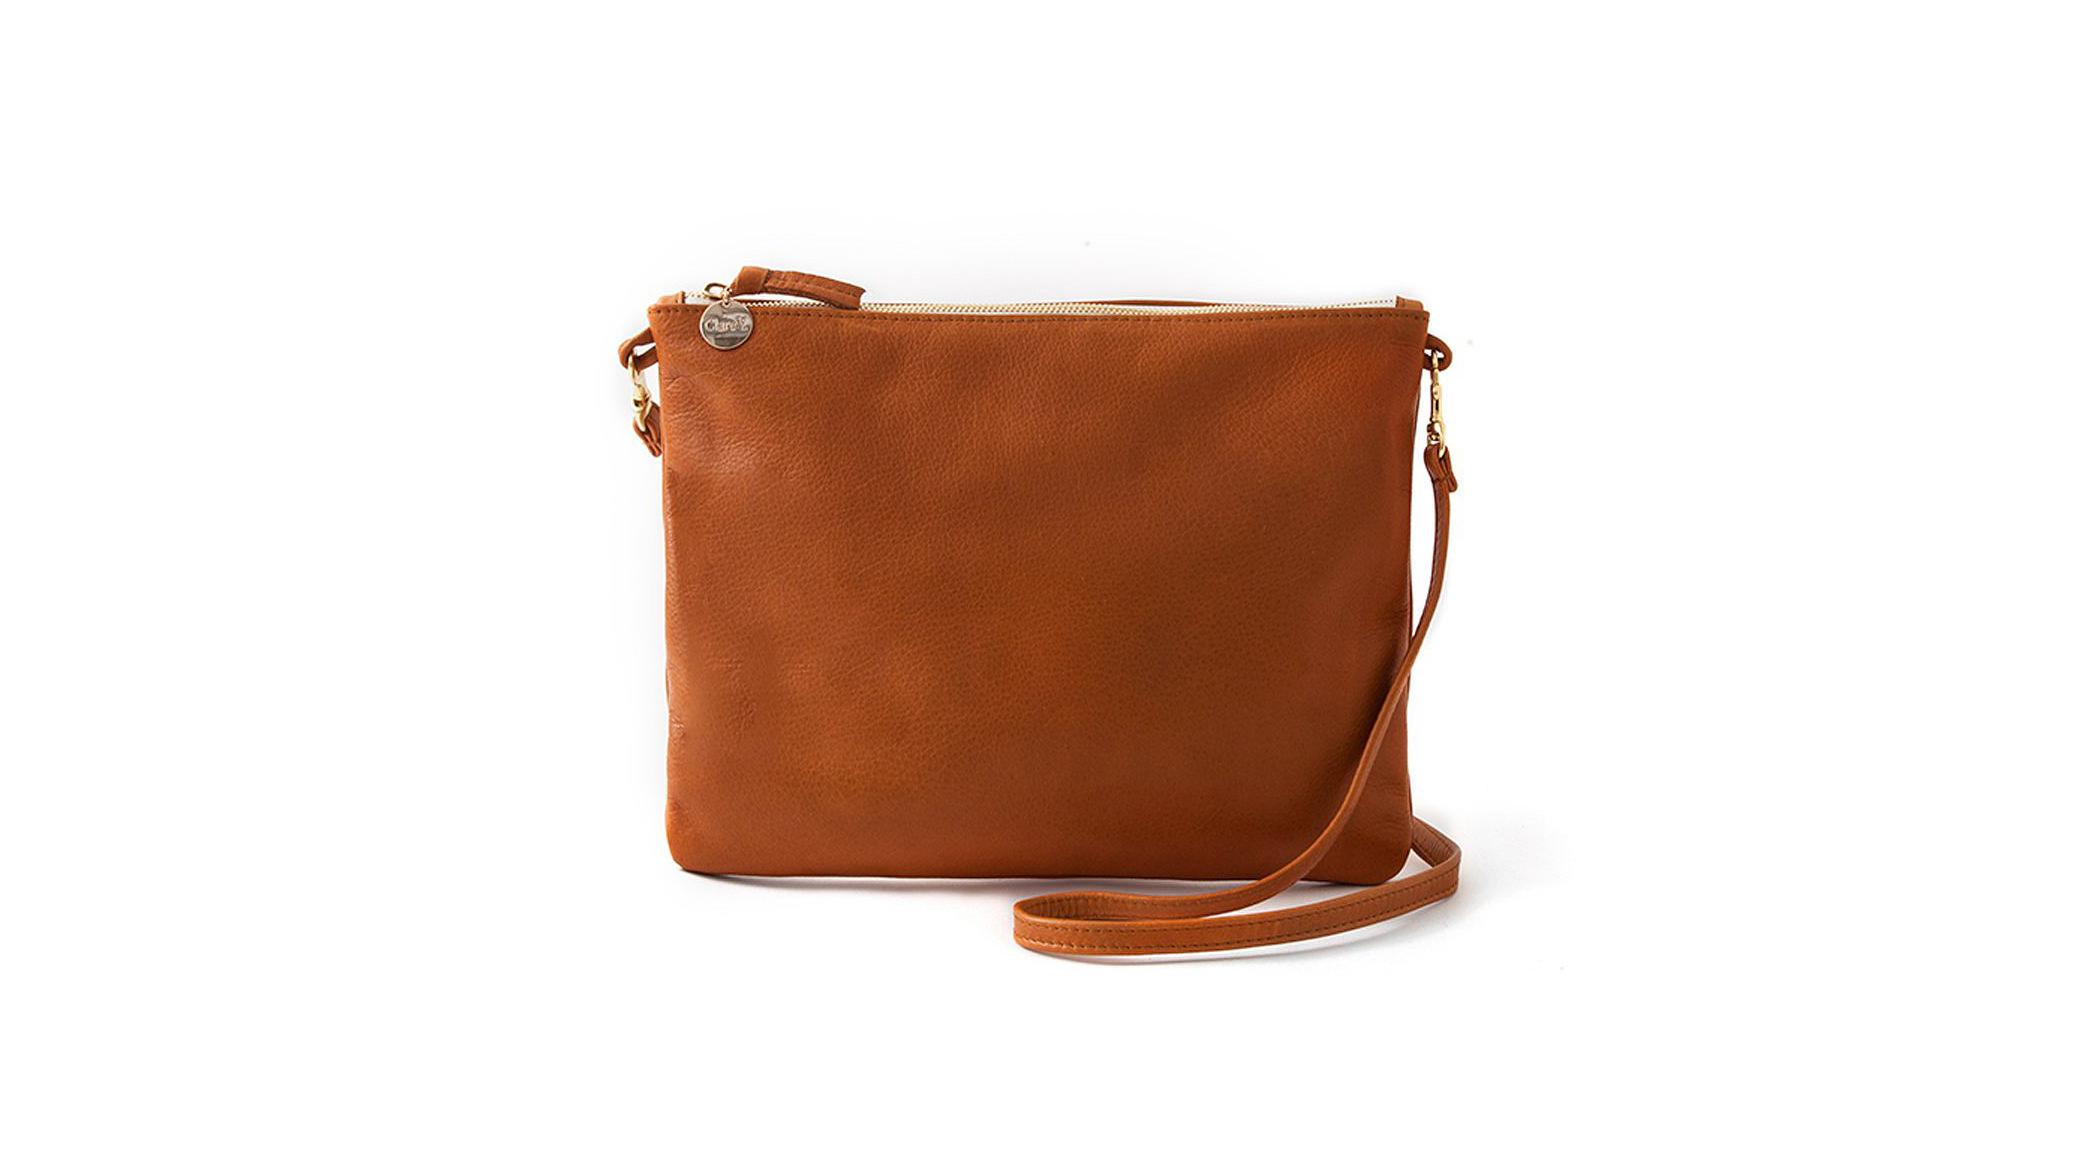 darcy honeymoon essentials clare v crossbody bag